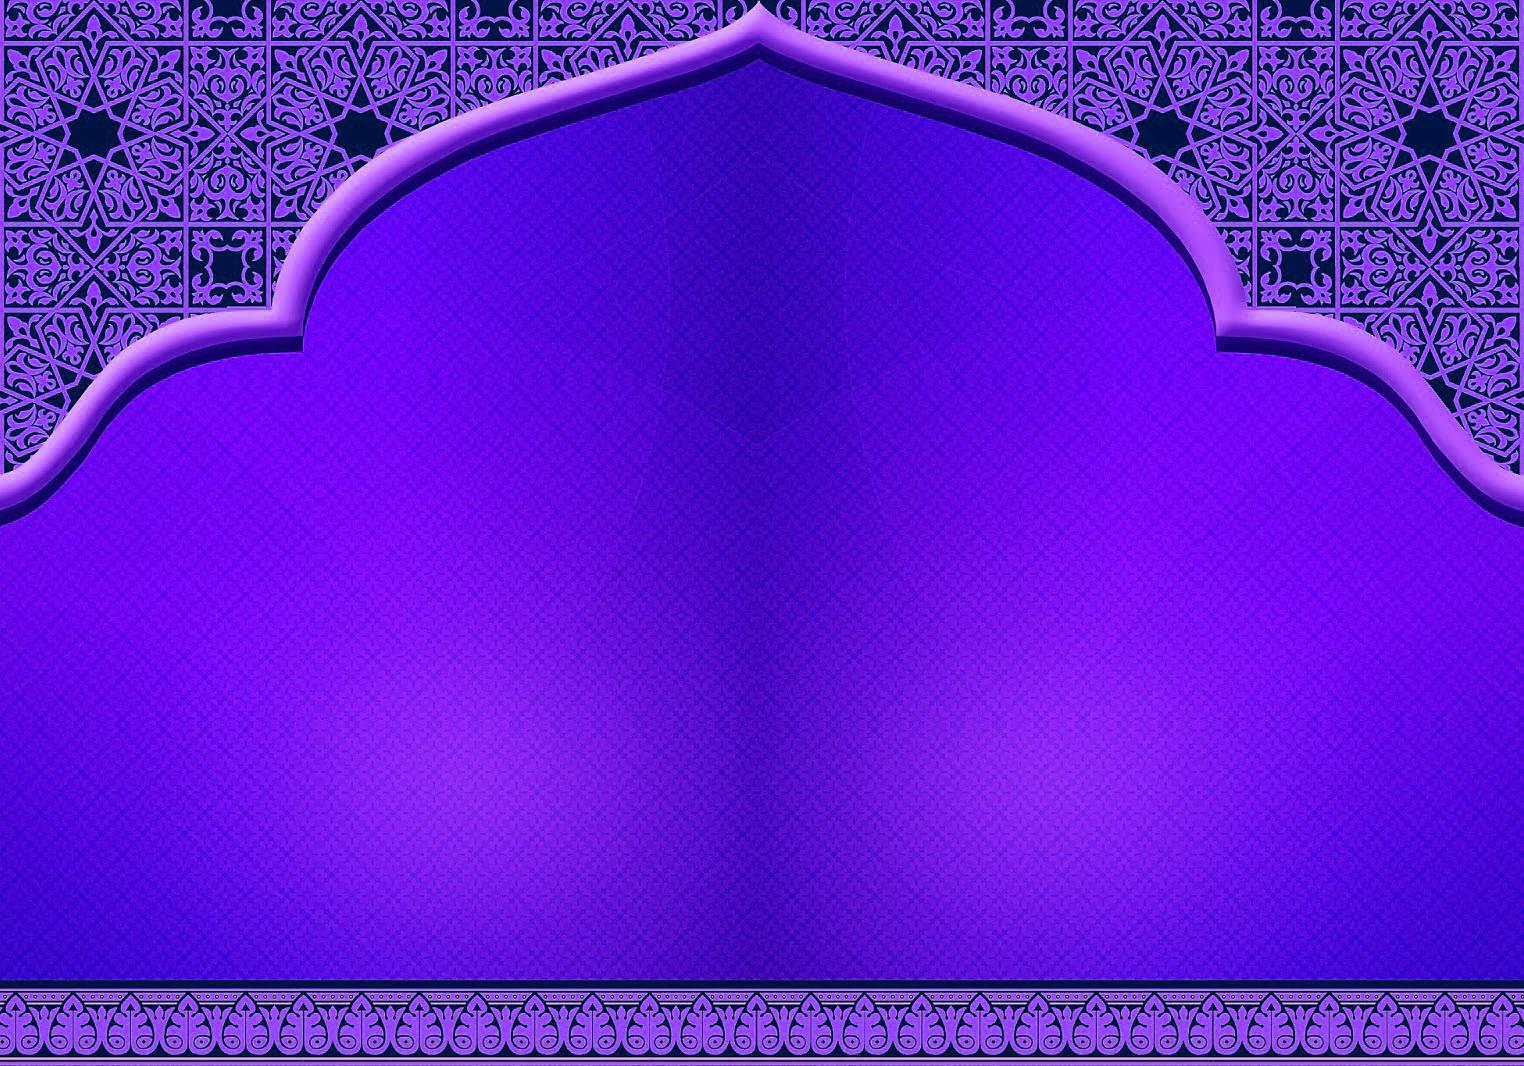 Koleksi Gambar Background Animasi Islami Terbaru 2018